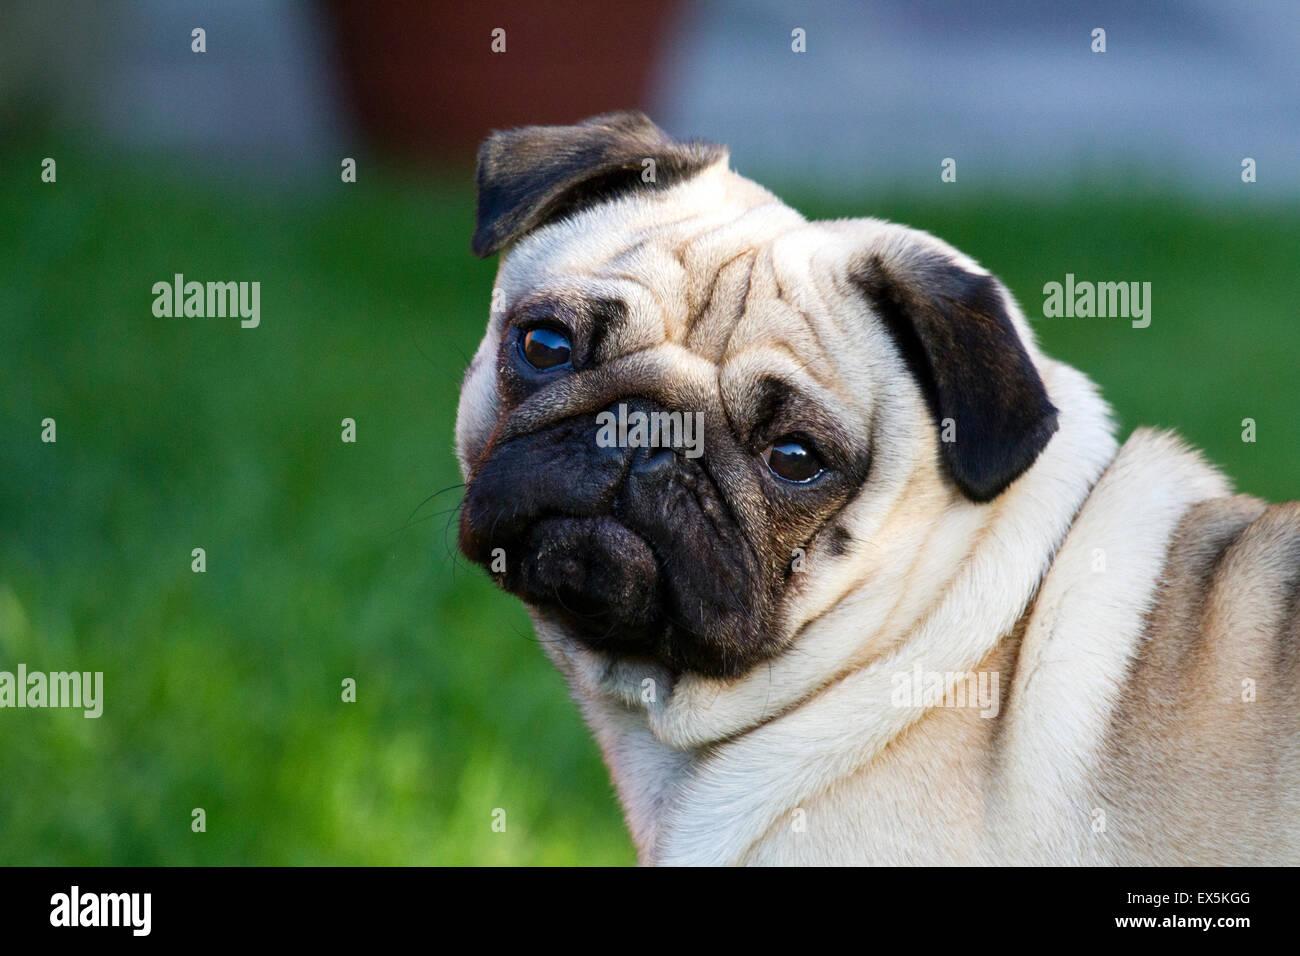 Pug dog harnessed whilst walking, Southport, Merseyside, UK - Stock Image